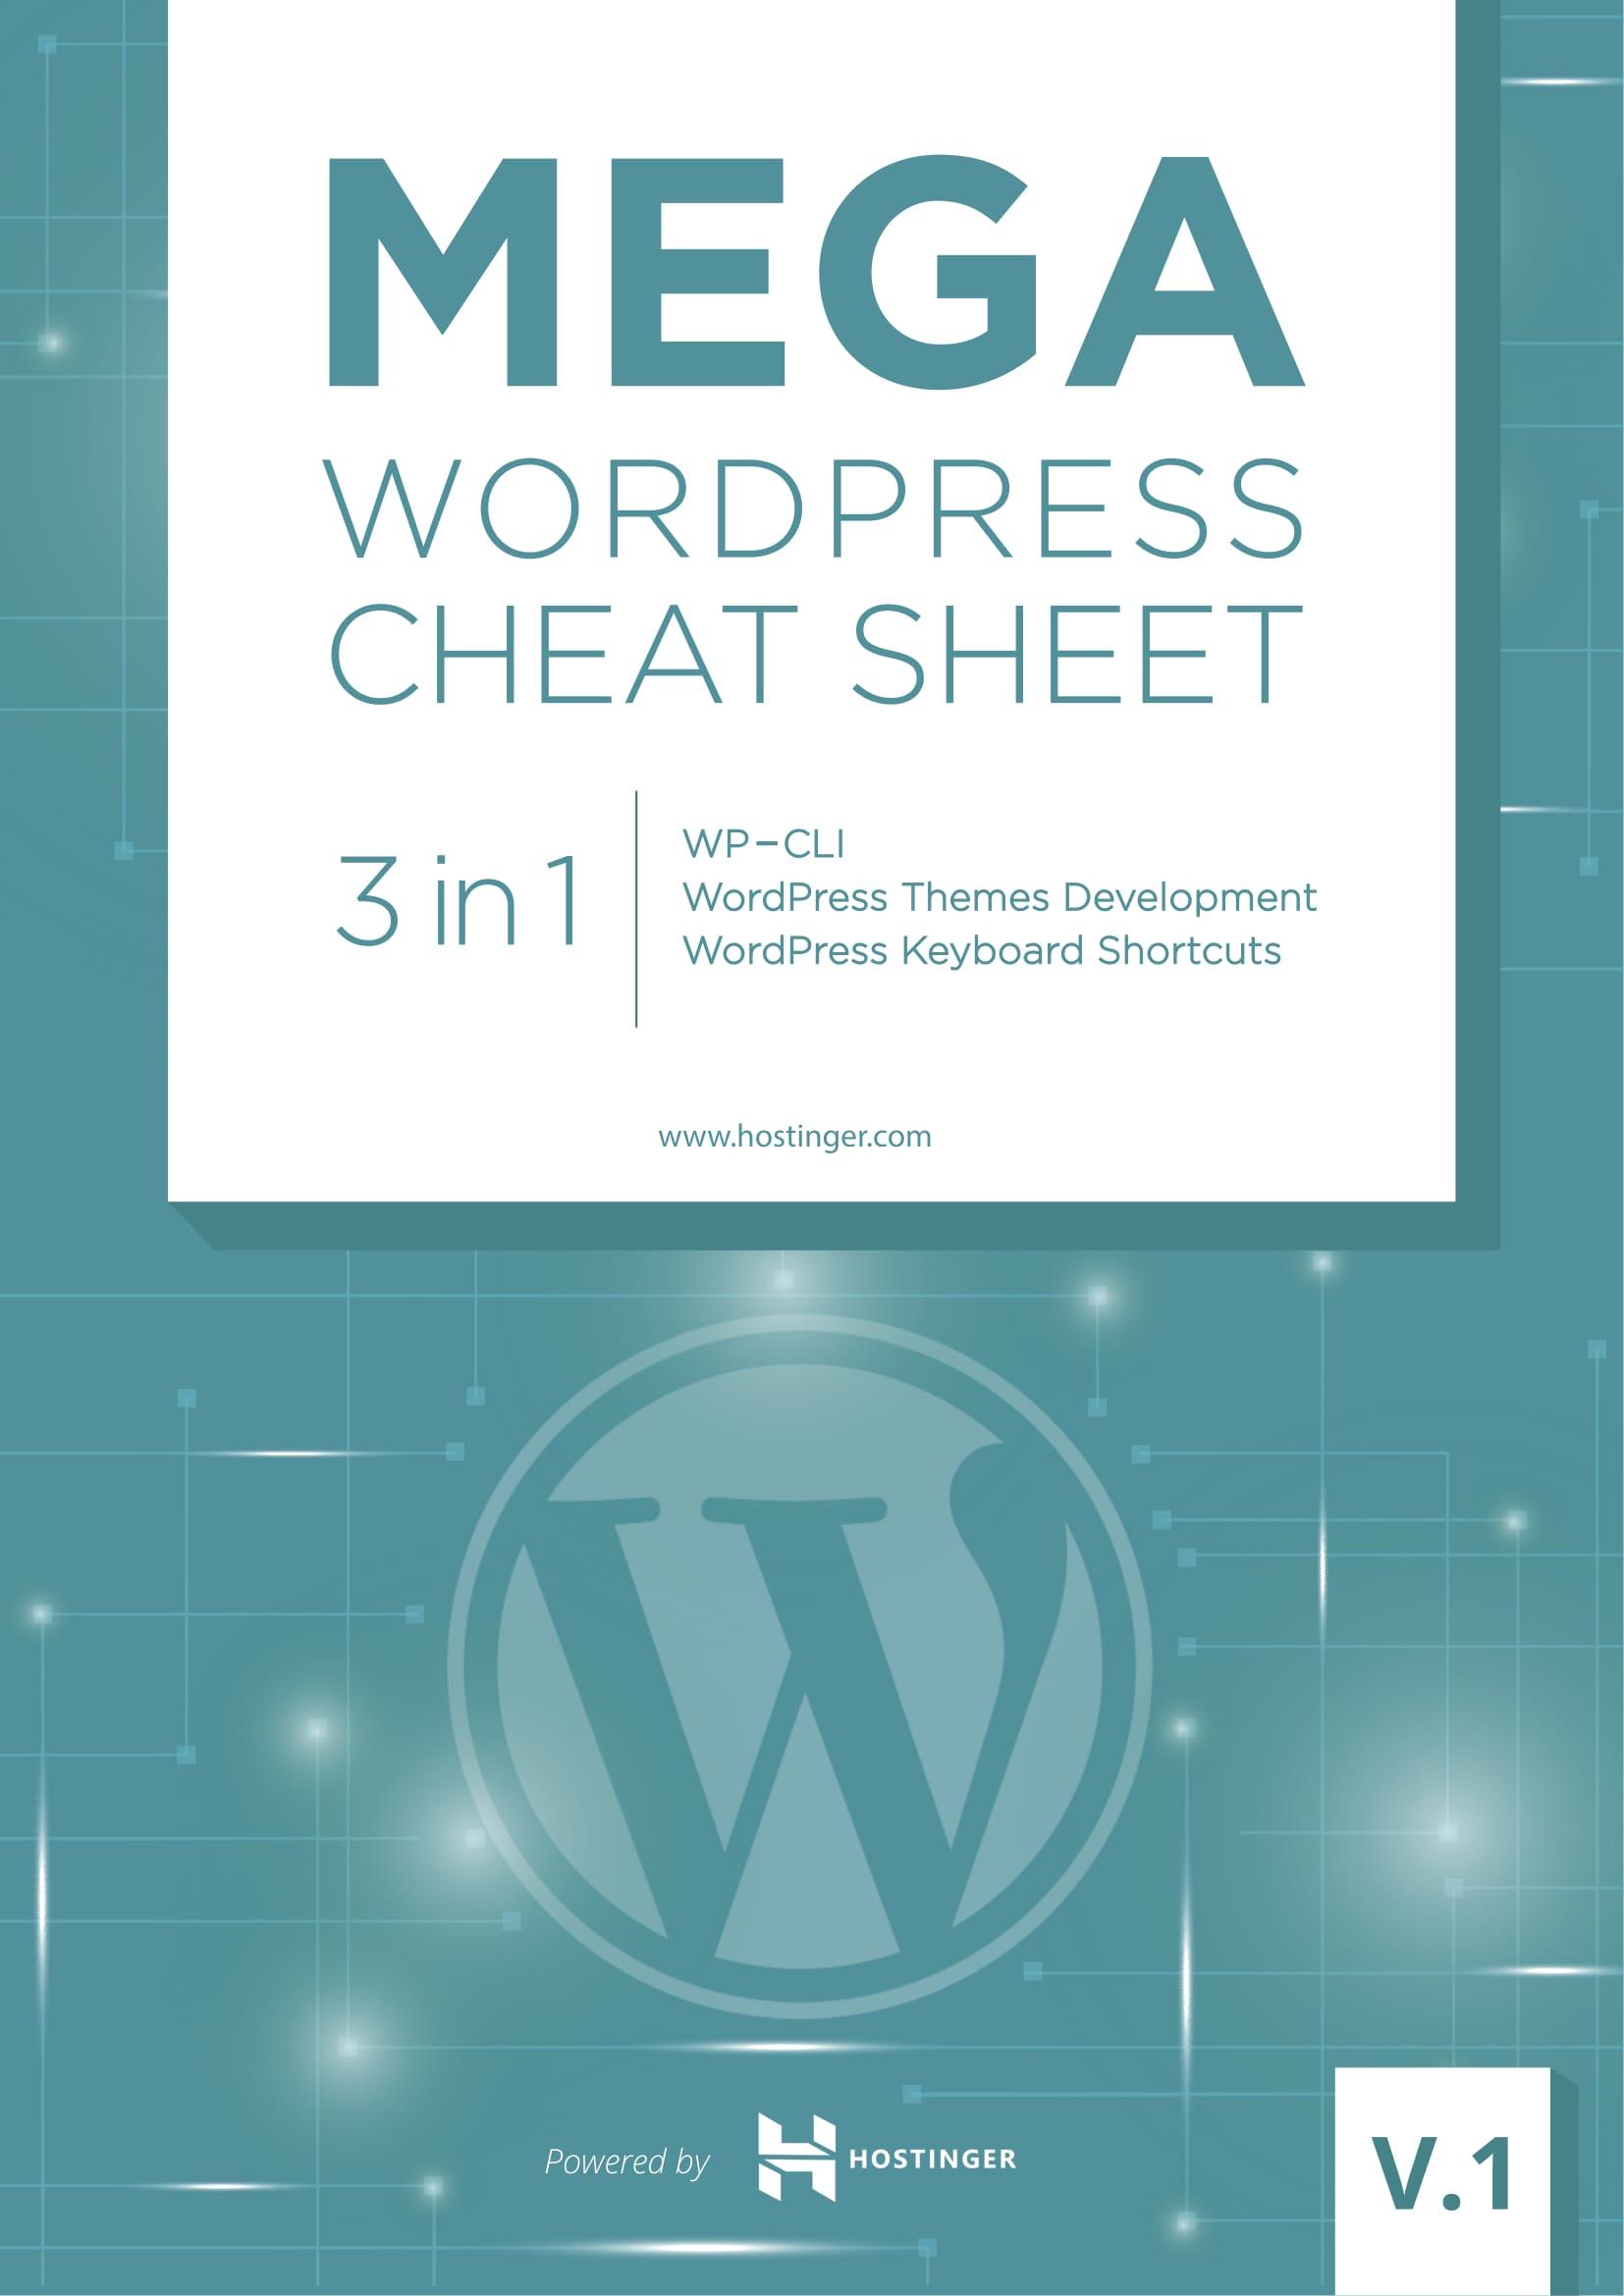 mega-wordpress-cheat-sheet-version-1-01